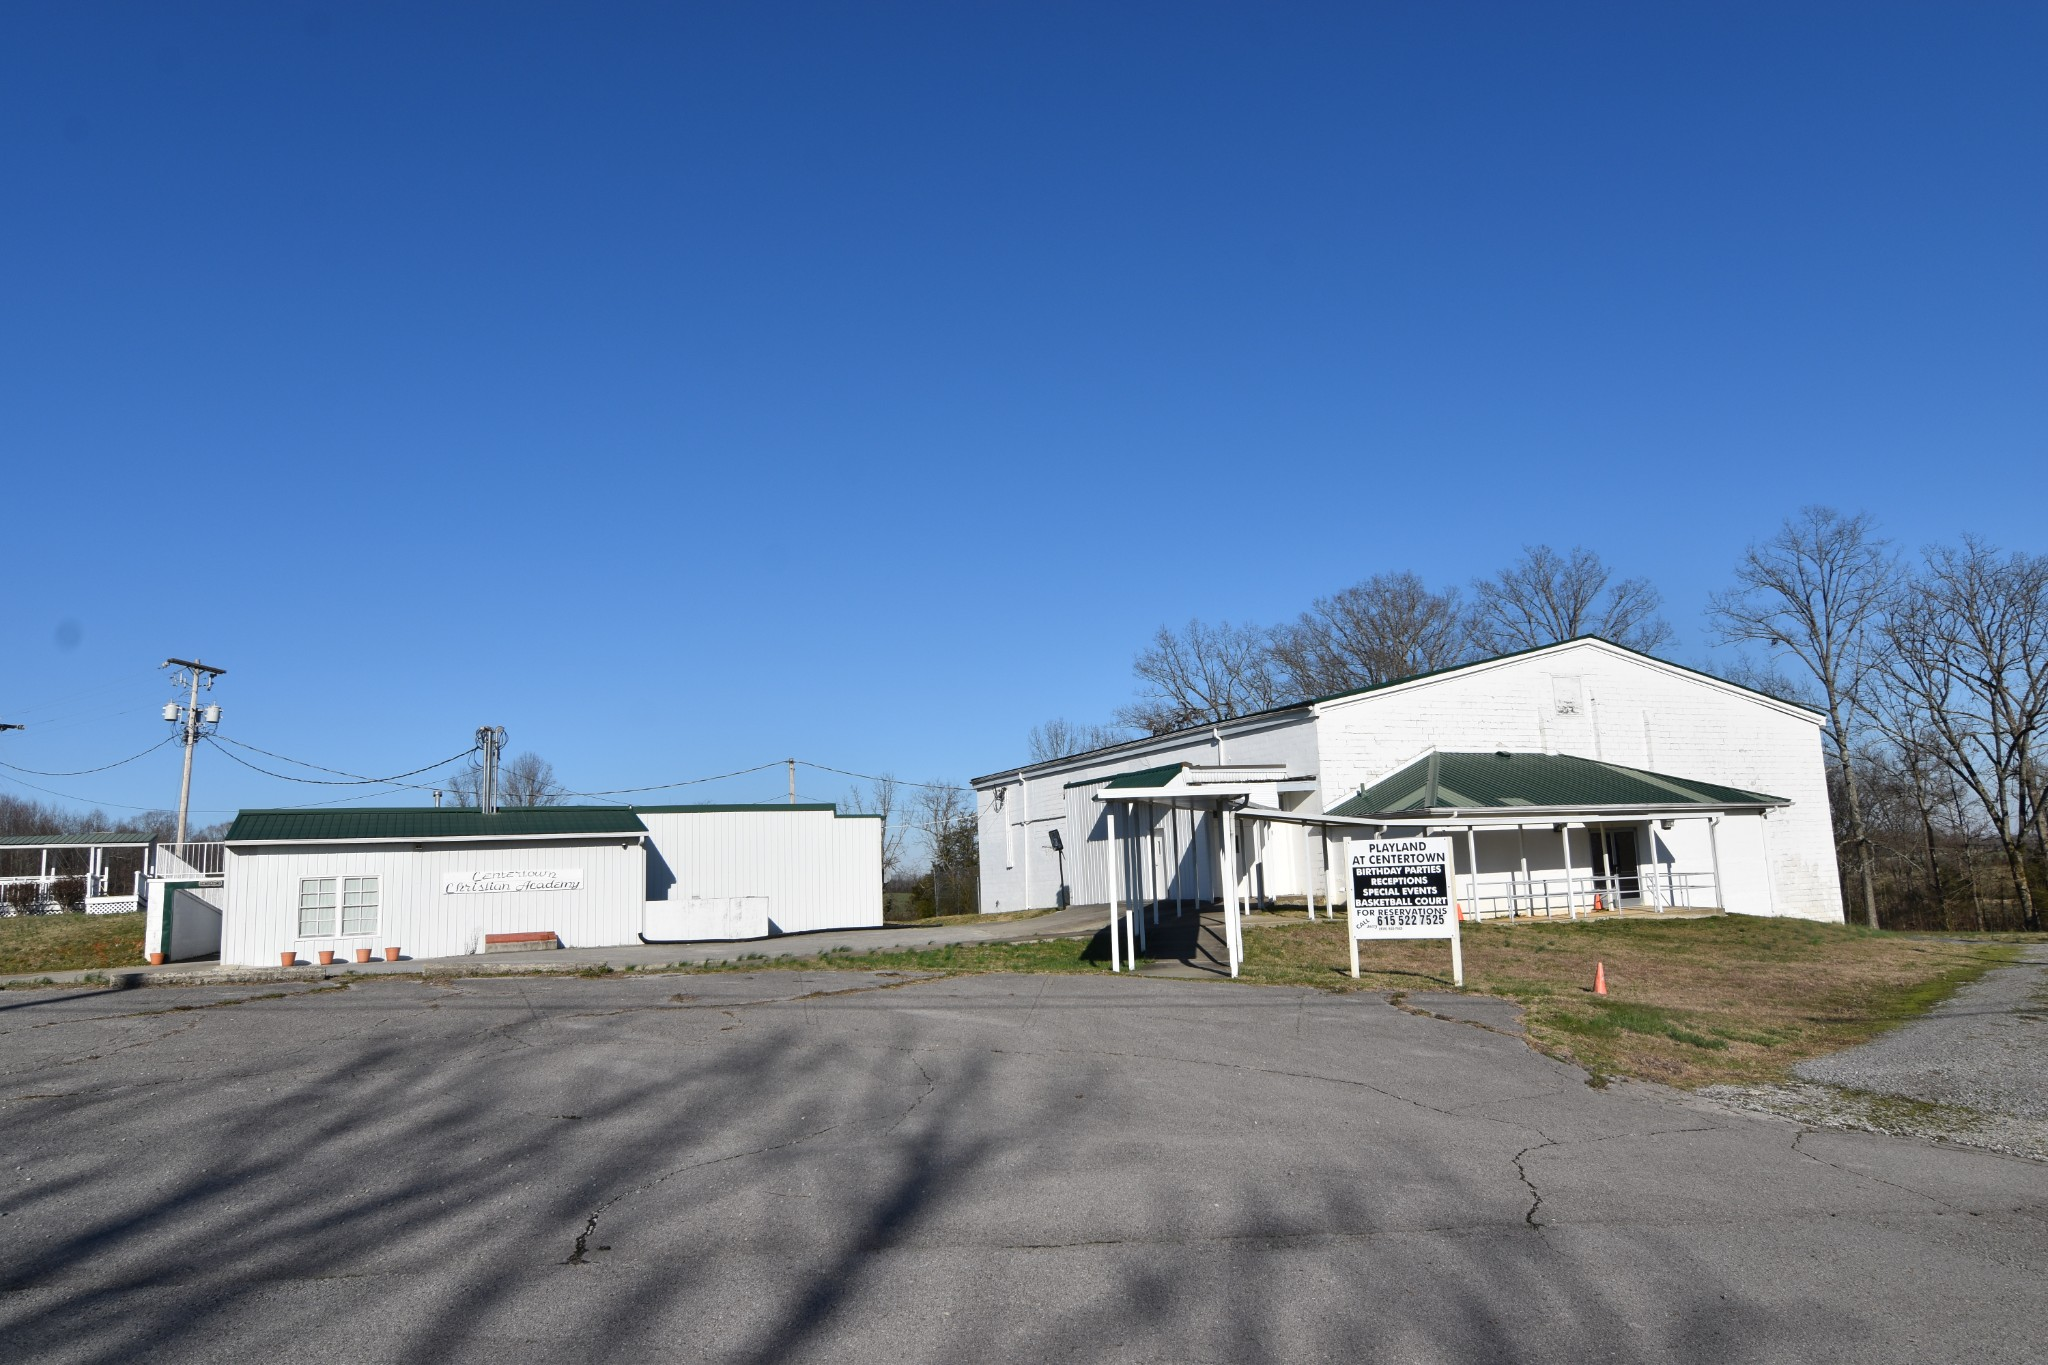 252 Line St, Mc Minnville, TN 37110 - Mc Minnville, TN real estate listing